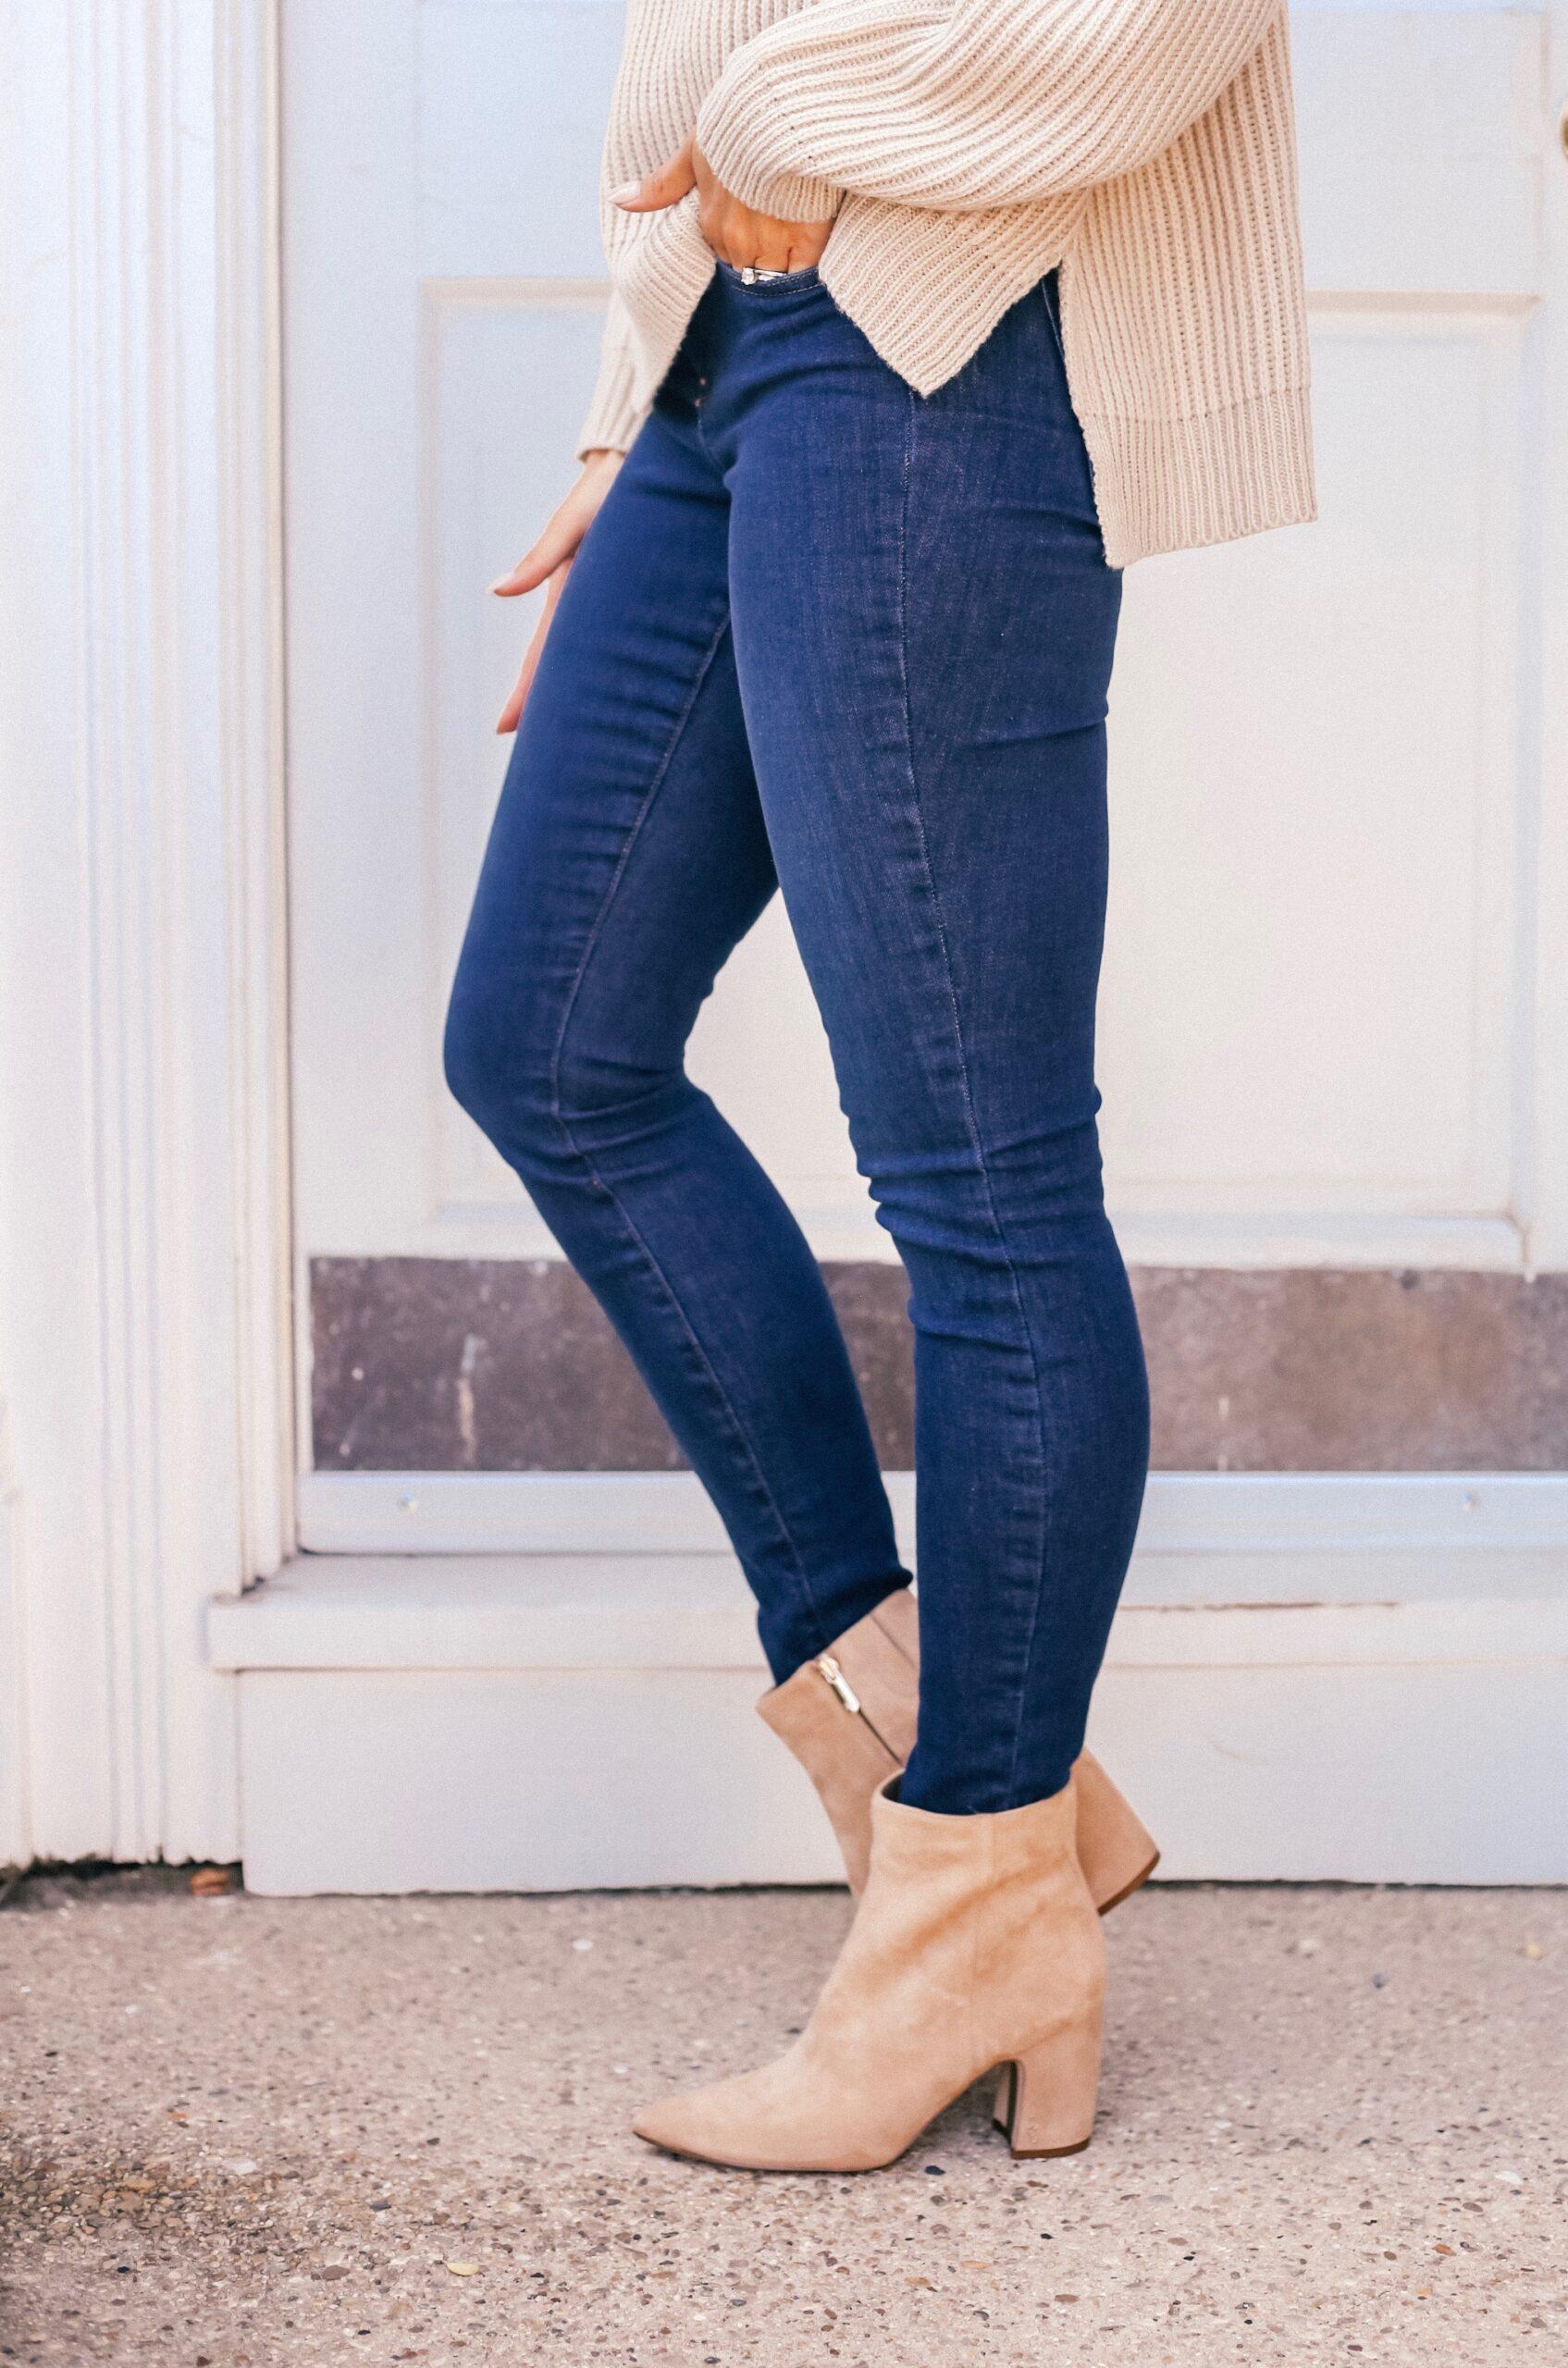 Jeans, Booties